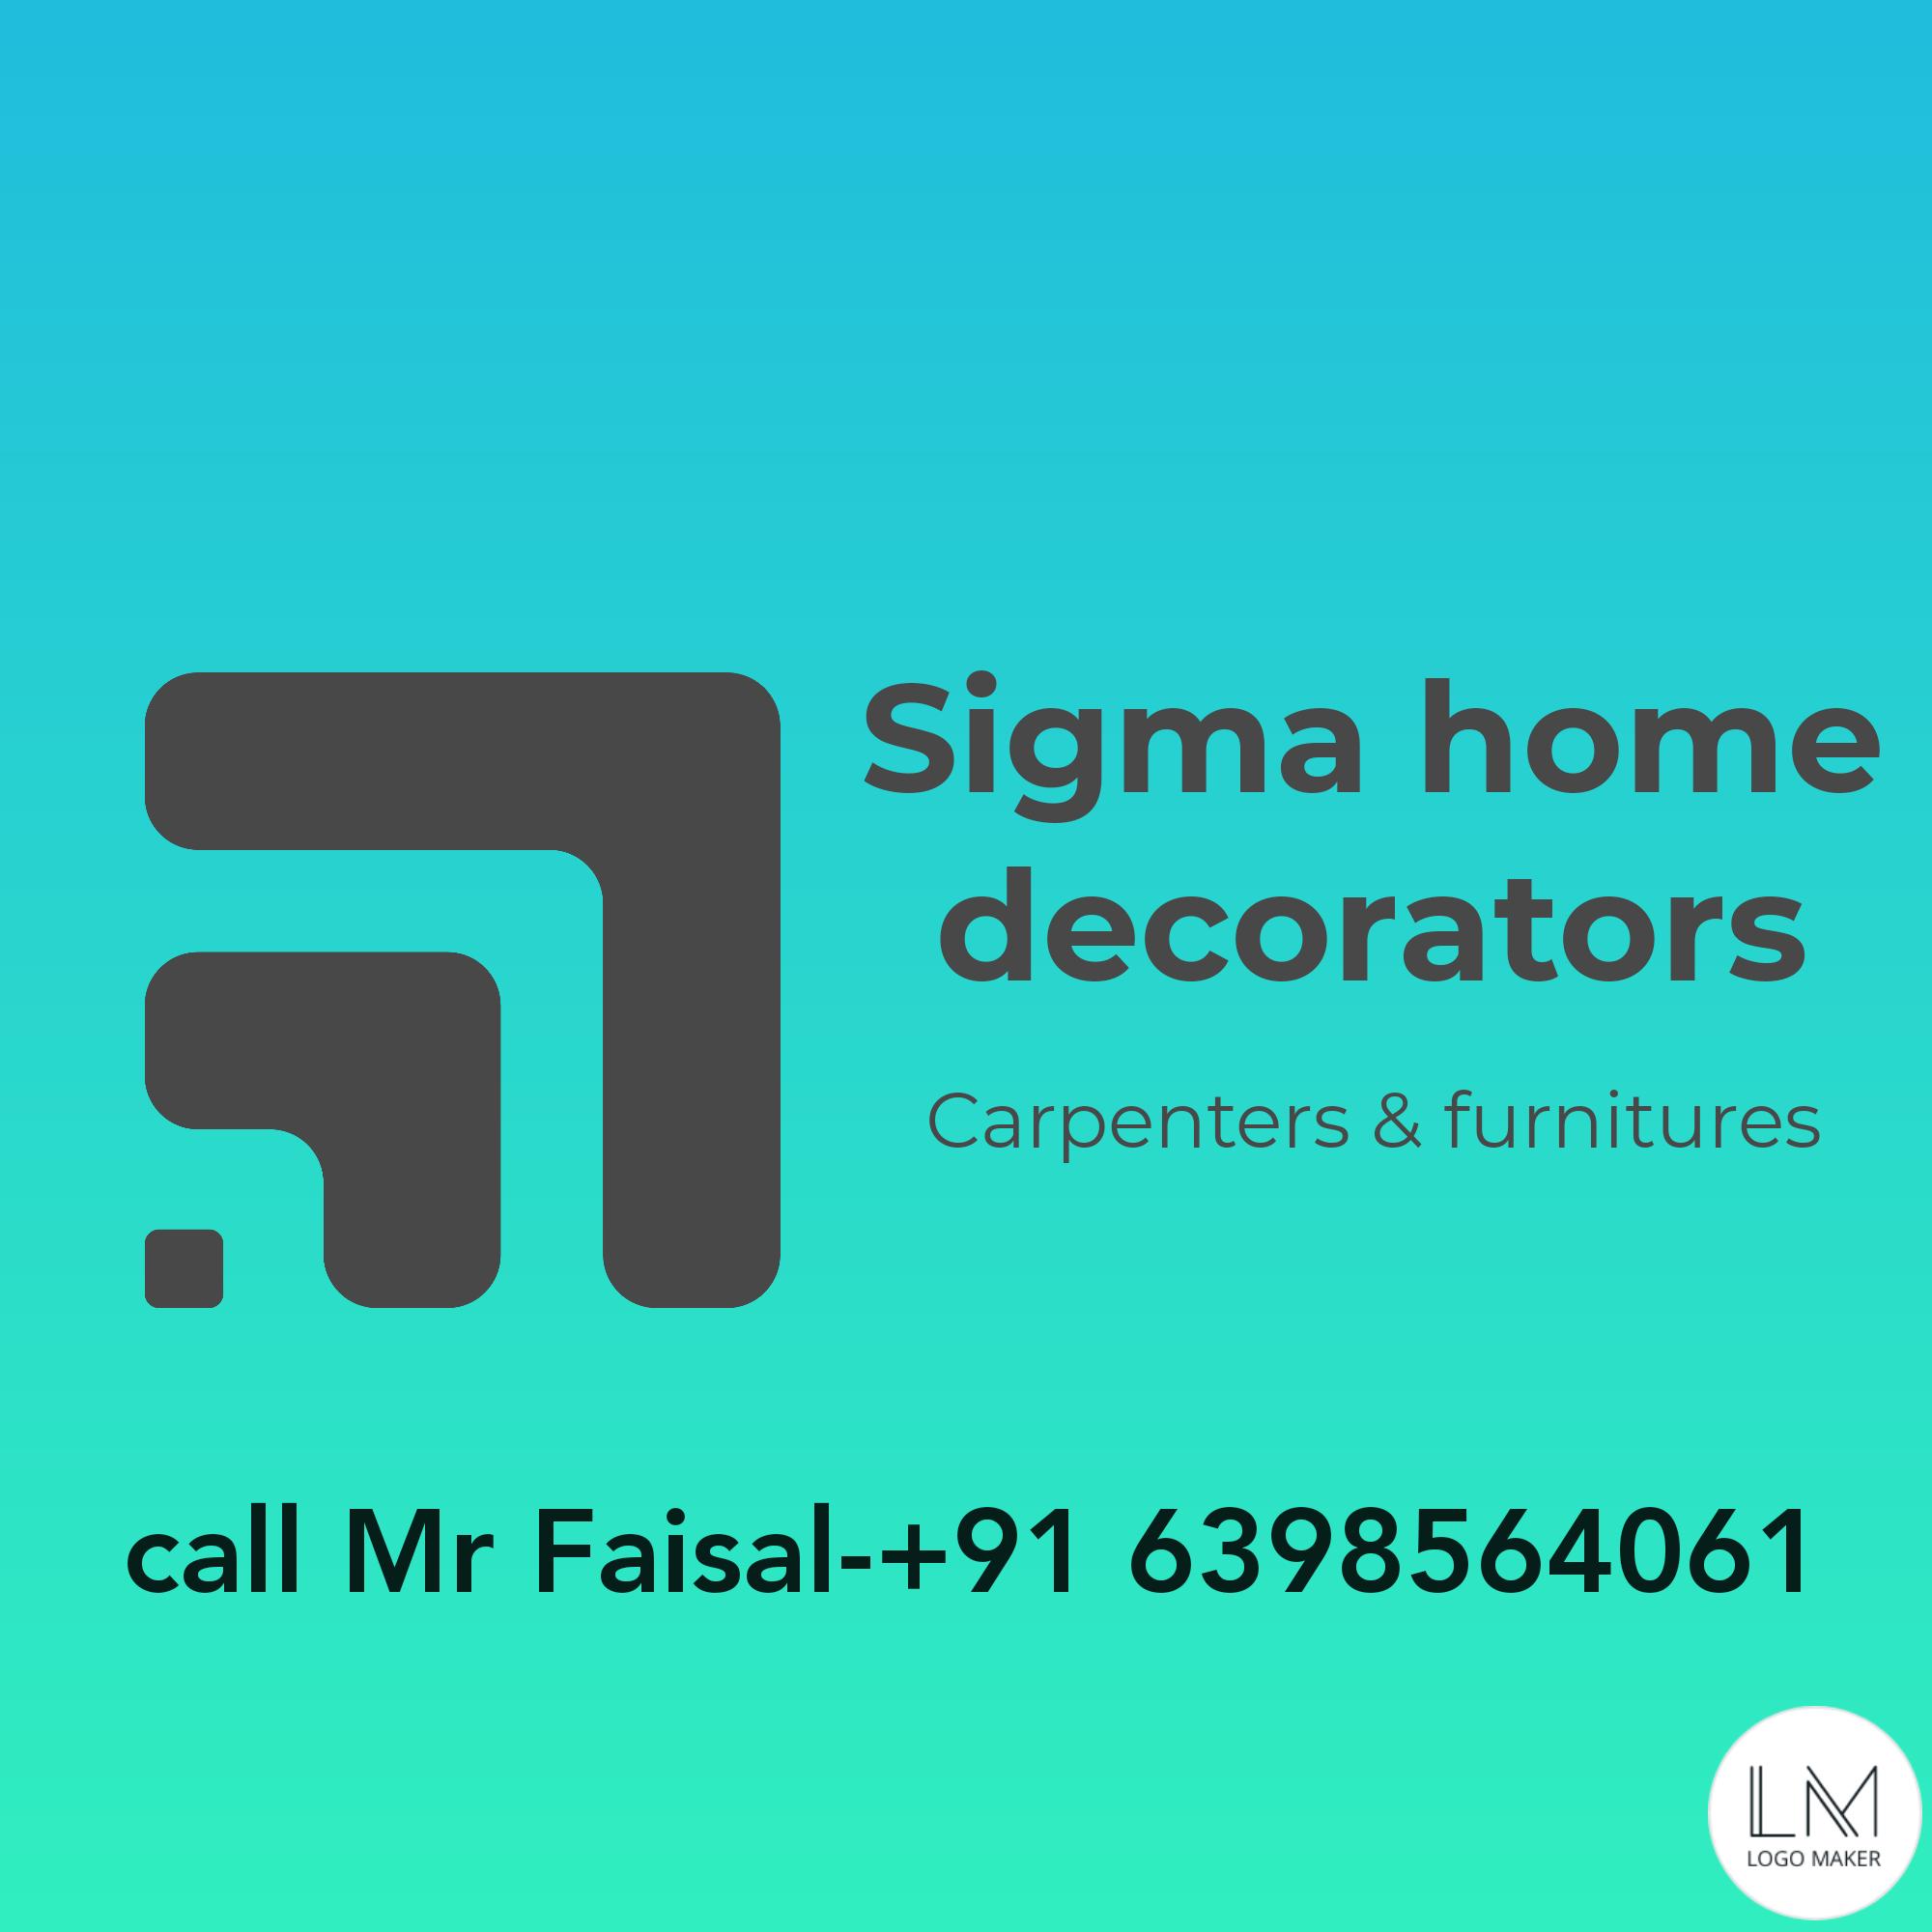 Sigma carpenters and furniture in saharanpur  in Saharanpur